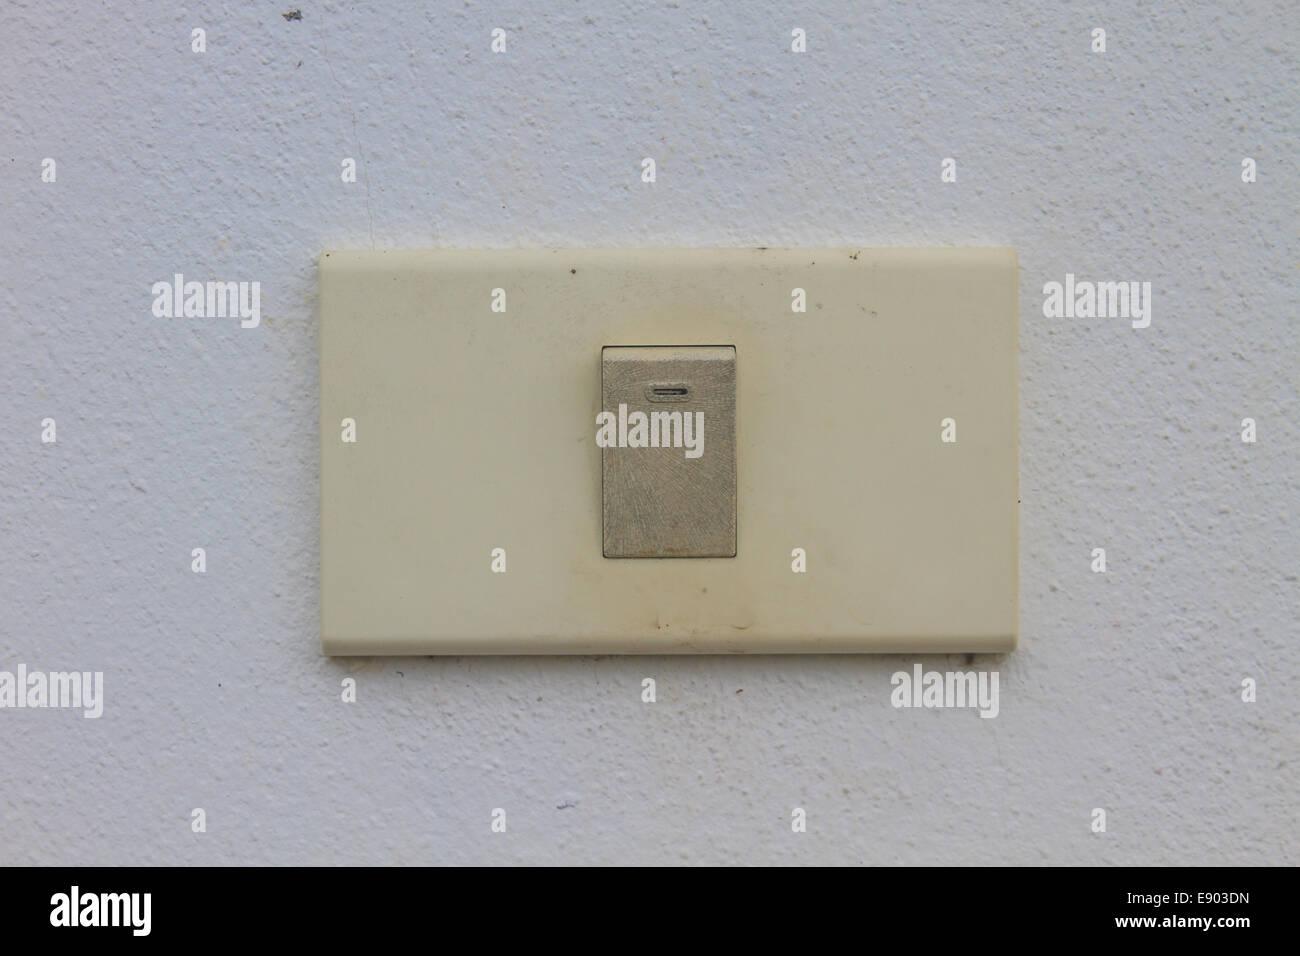 plaster light switch stockfotos plaster light switch bilder alamy. Black Bedroom Furniture Sets. Home Design Ideas